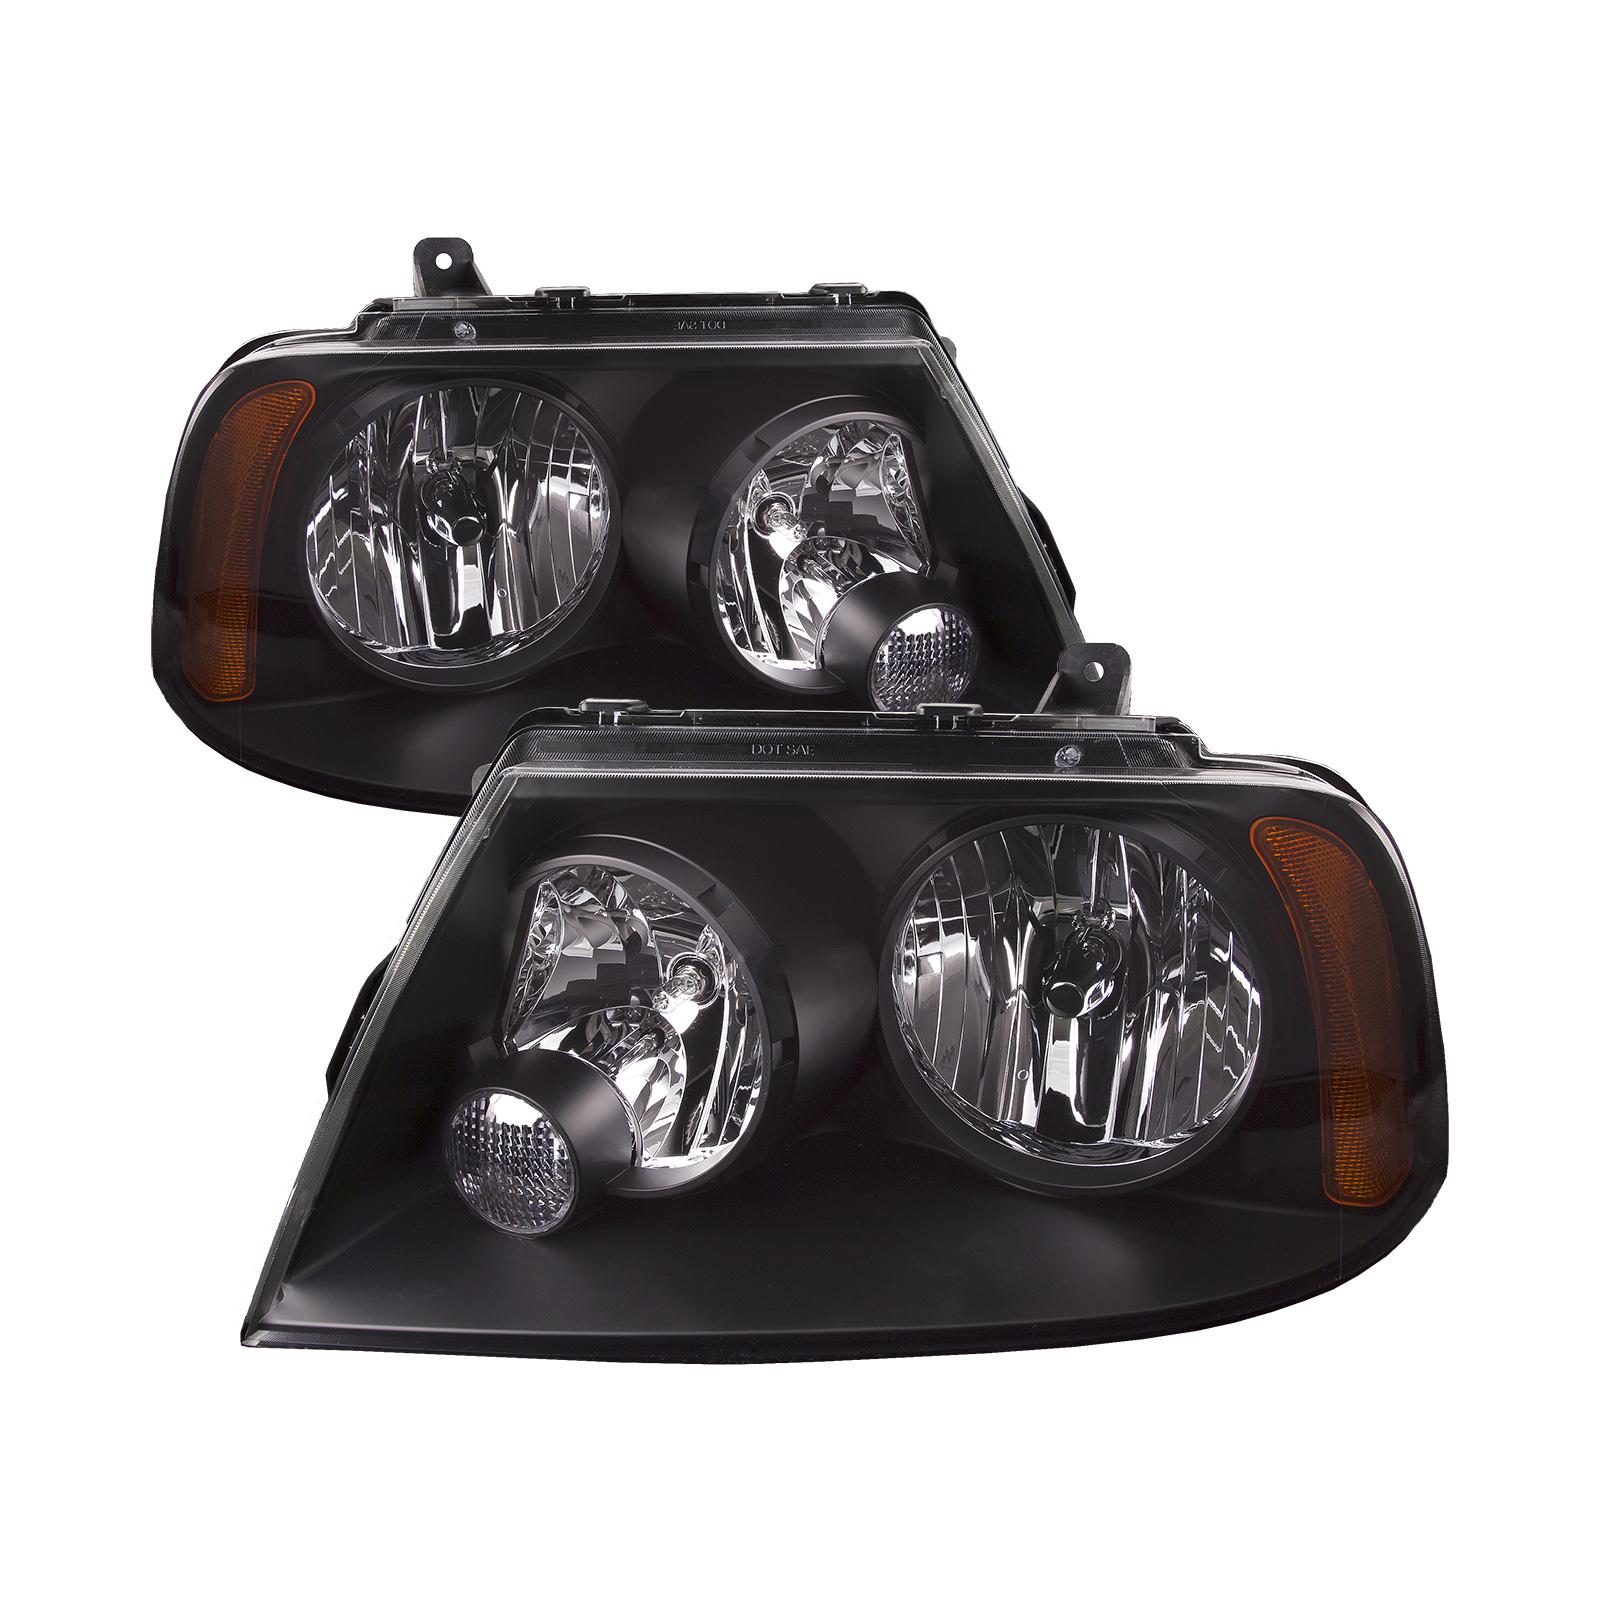 Details About Fits 03 06 Lincoln Navigator Headlights Headlamp Set Pair Black Housing